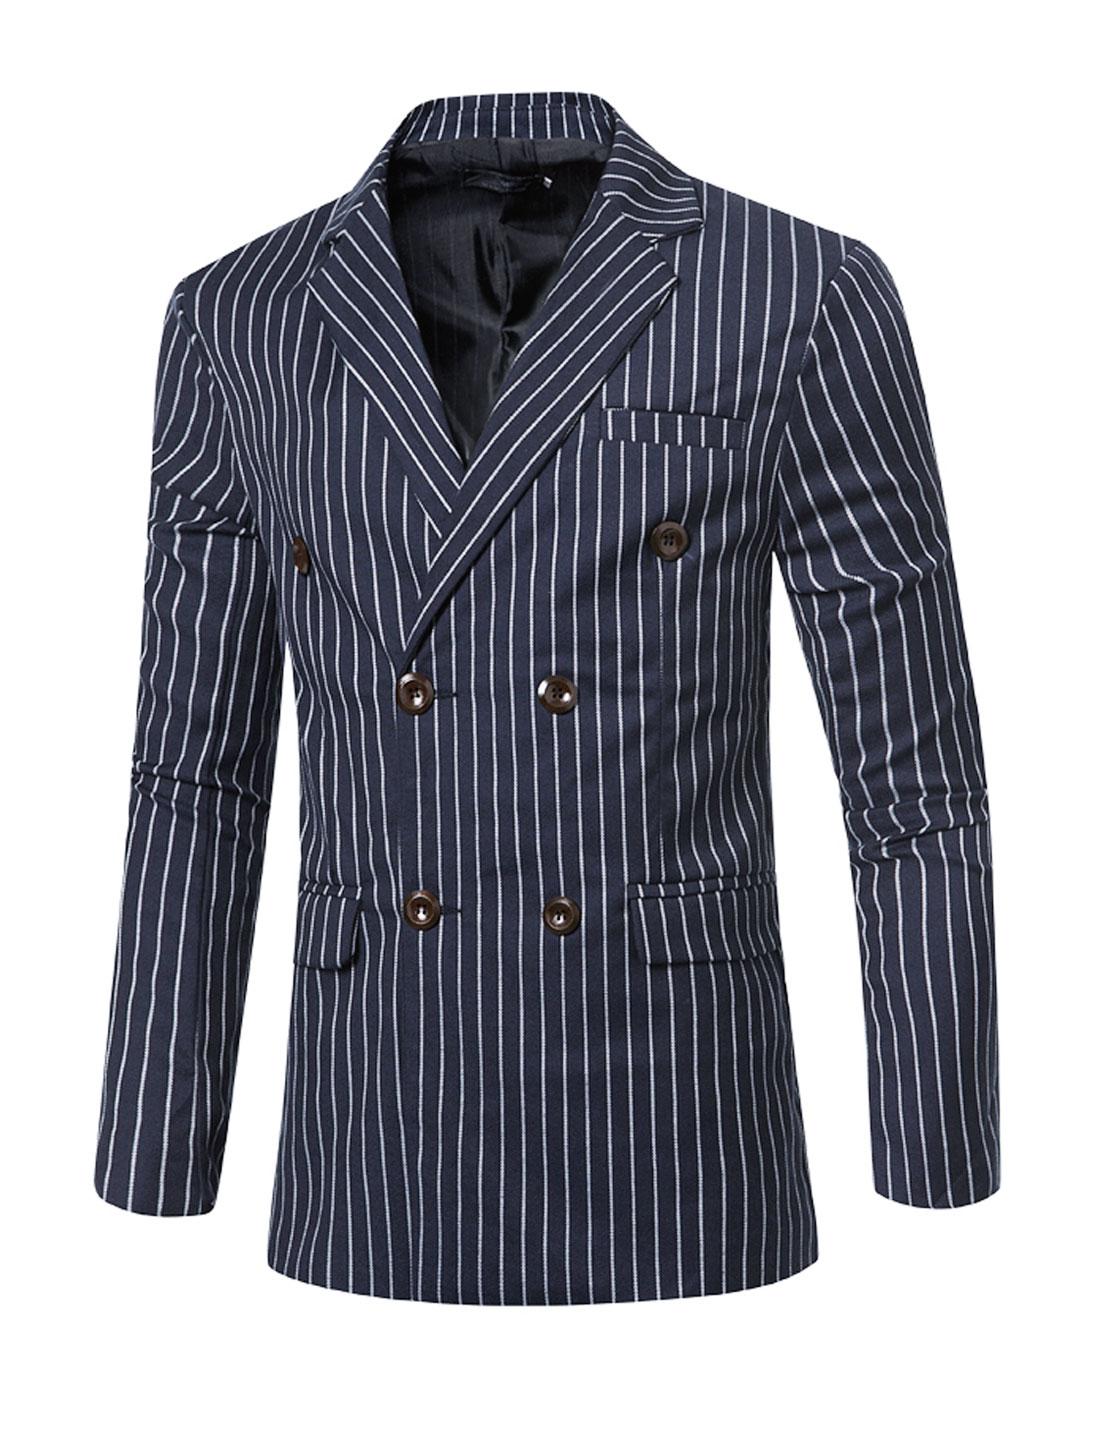 Men Padded Shoulder Double Breasted Striped Slim Fit Blazer Blue S